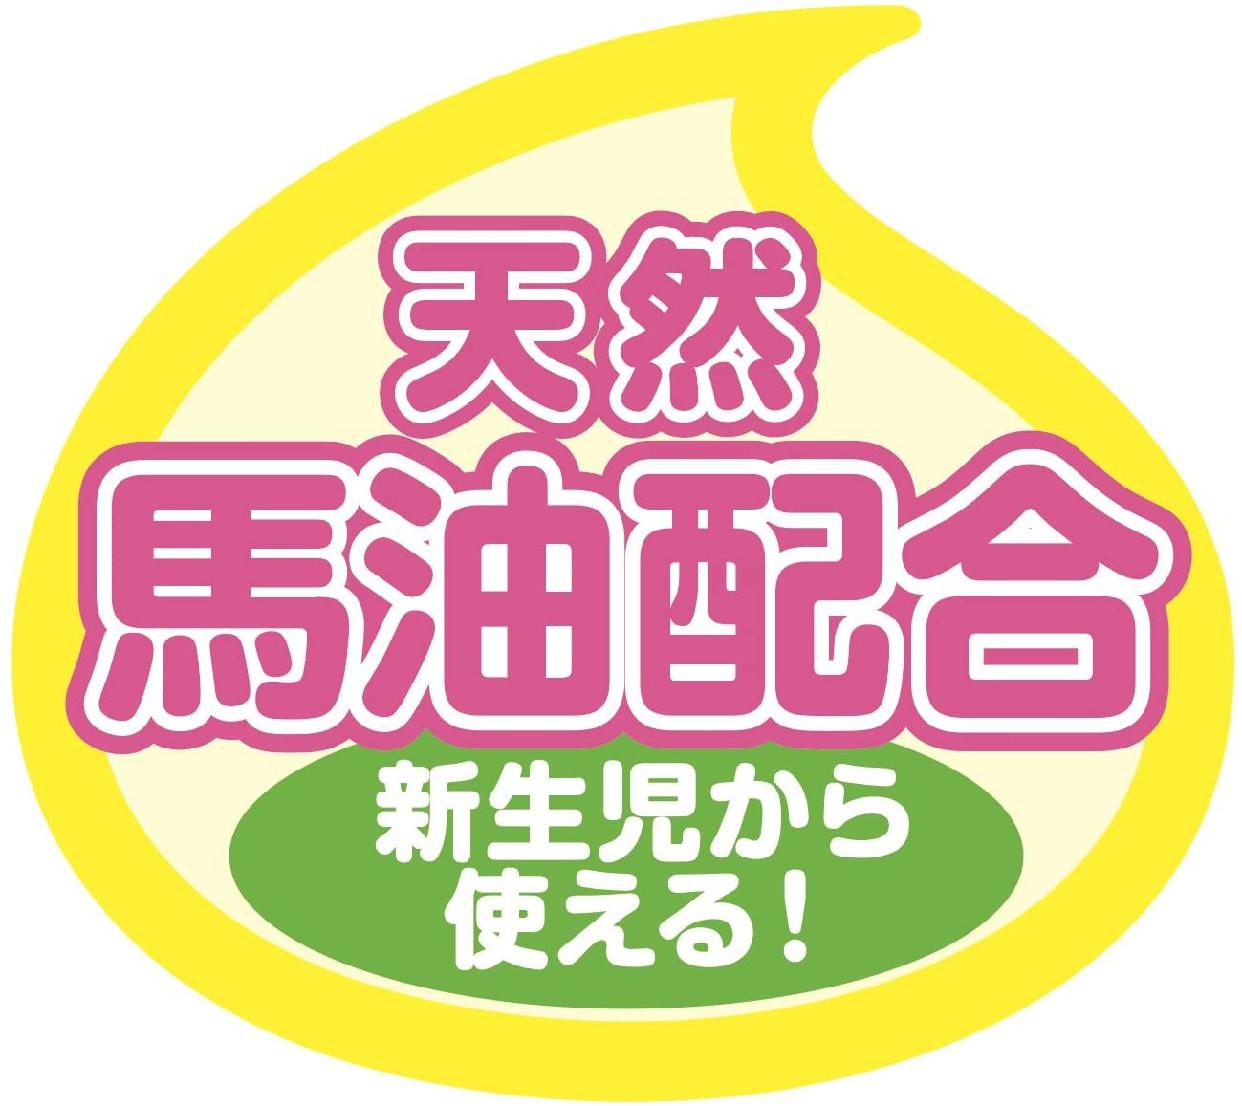 MADONNA(マドンナ)ベビーバーユマドンナ沐浴剤の商品画像5